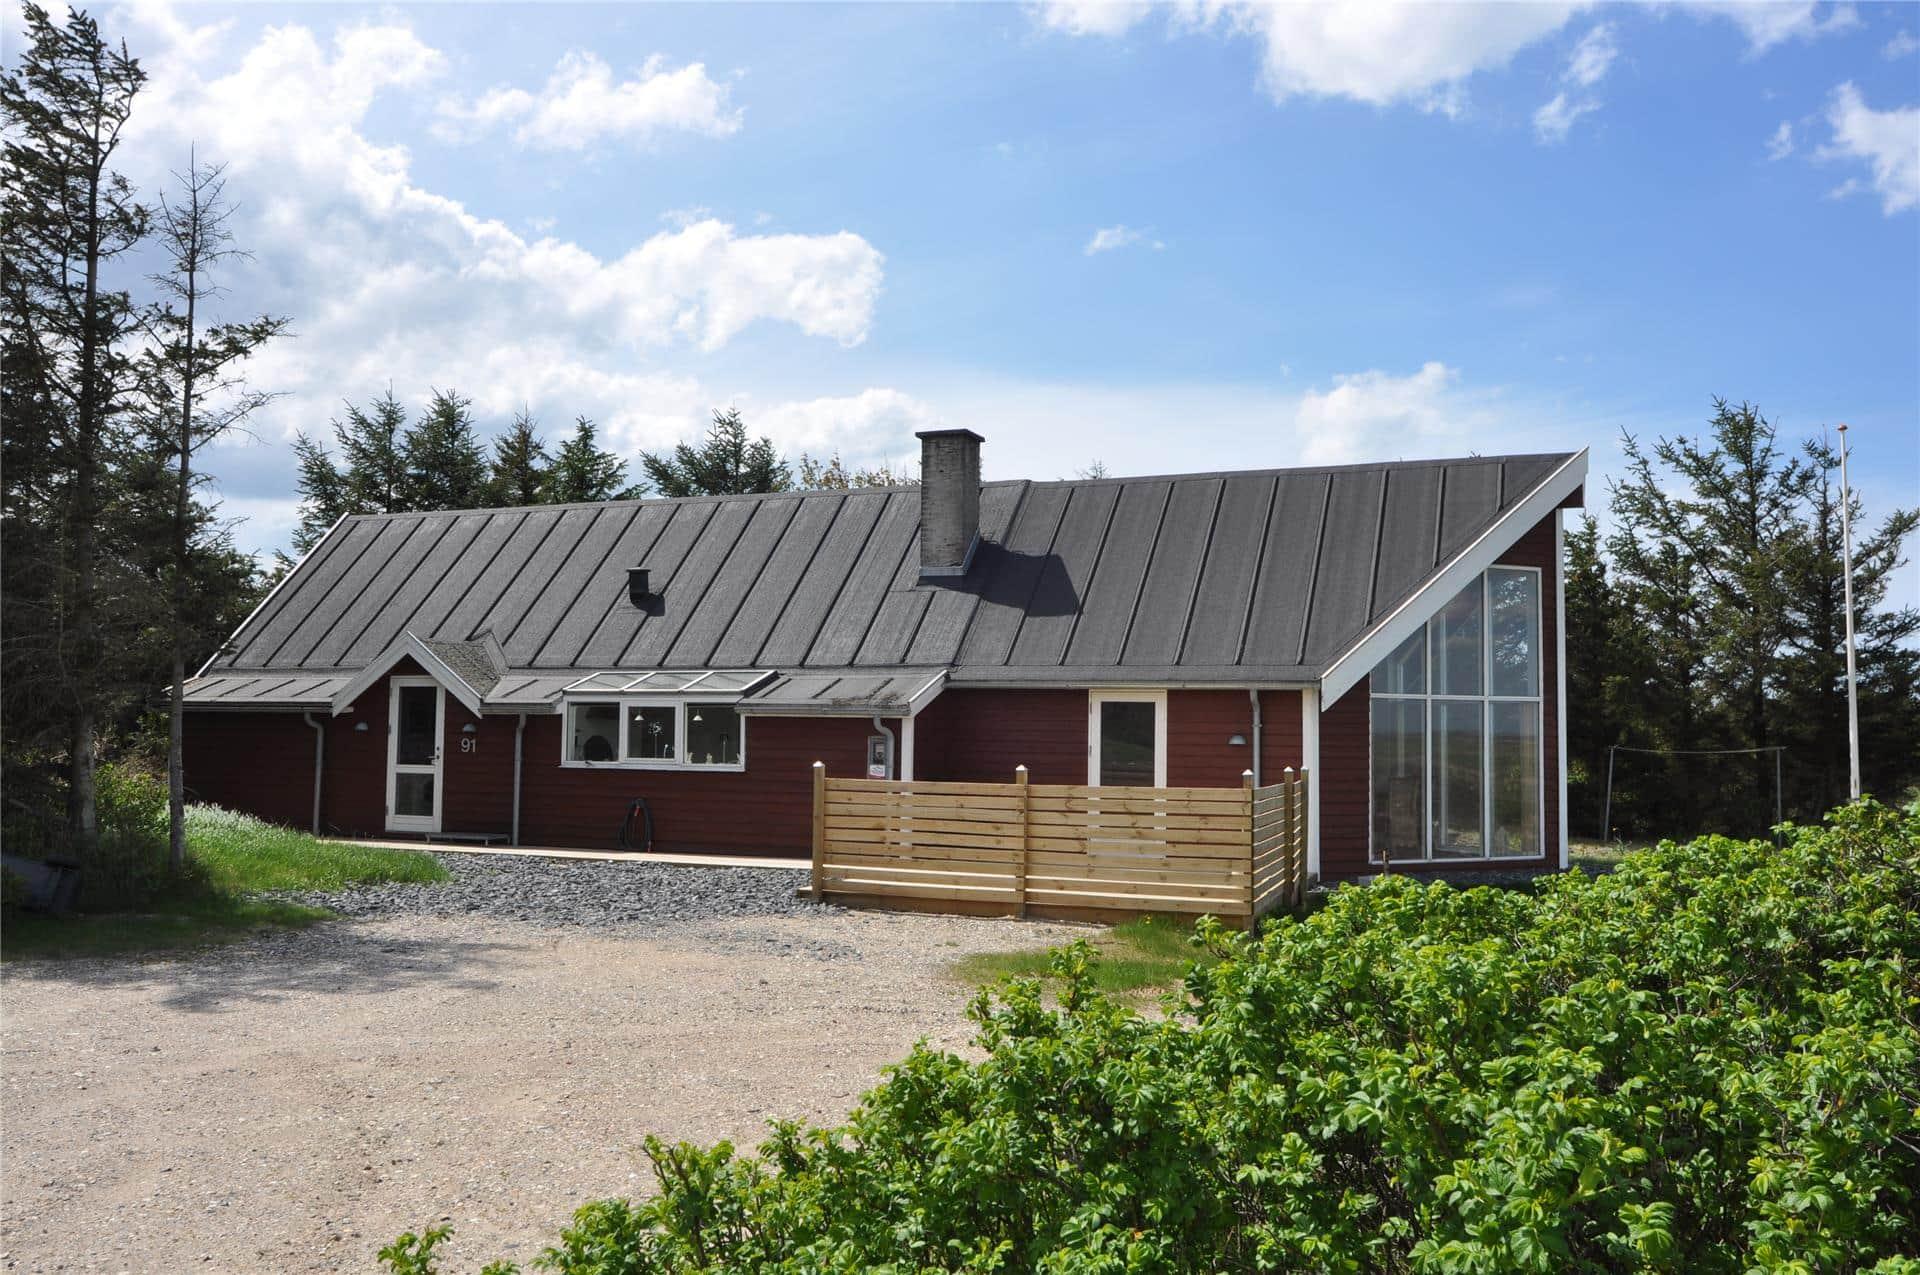 Bild 1-175 Ferienhaus 40830, Hagevej 91, DK - 6990 Ulfborg